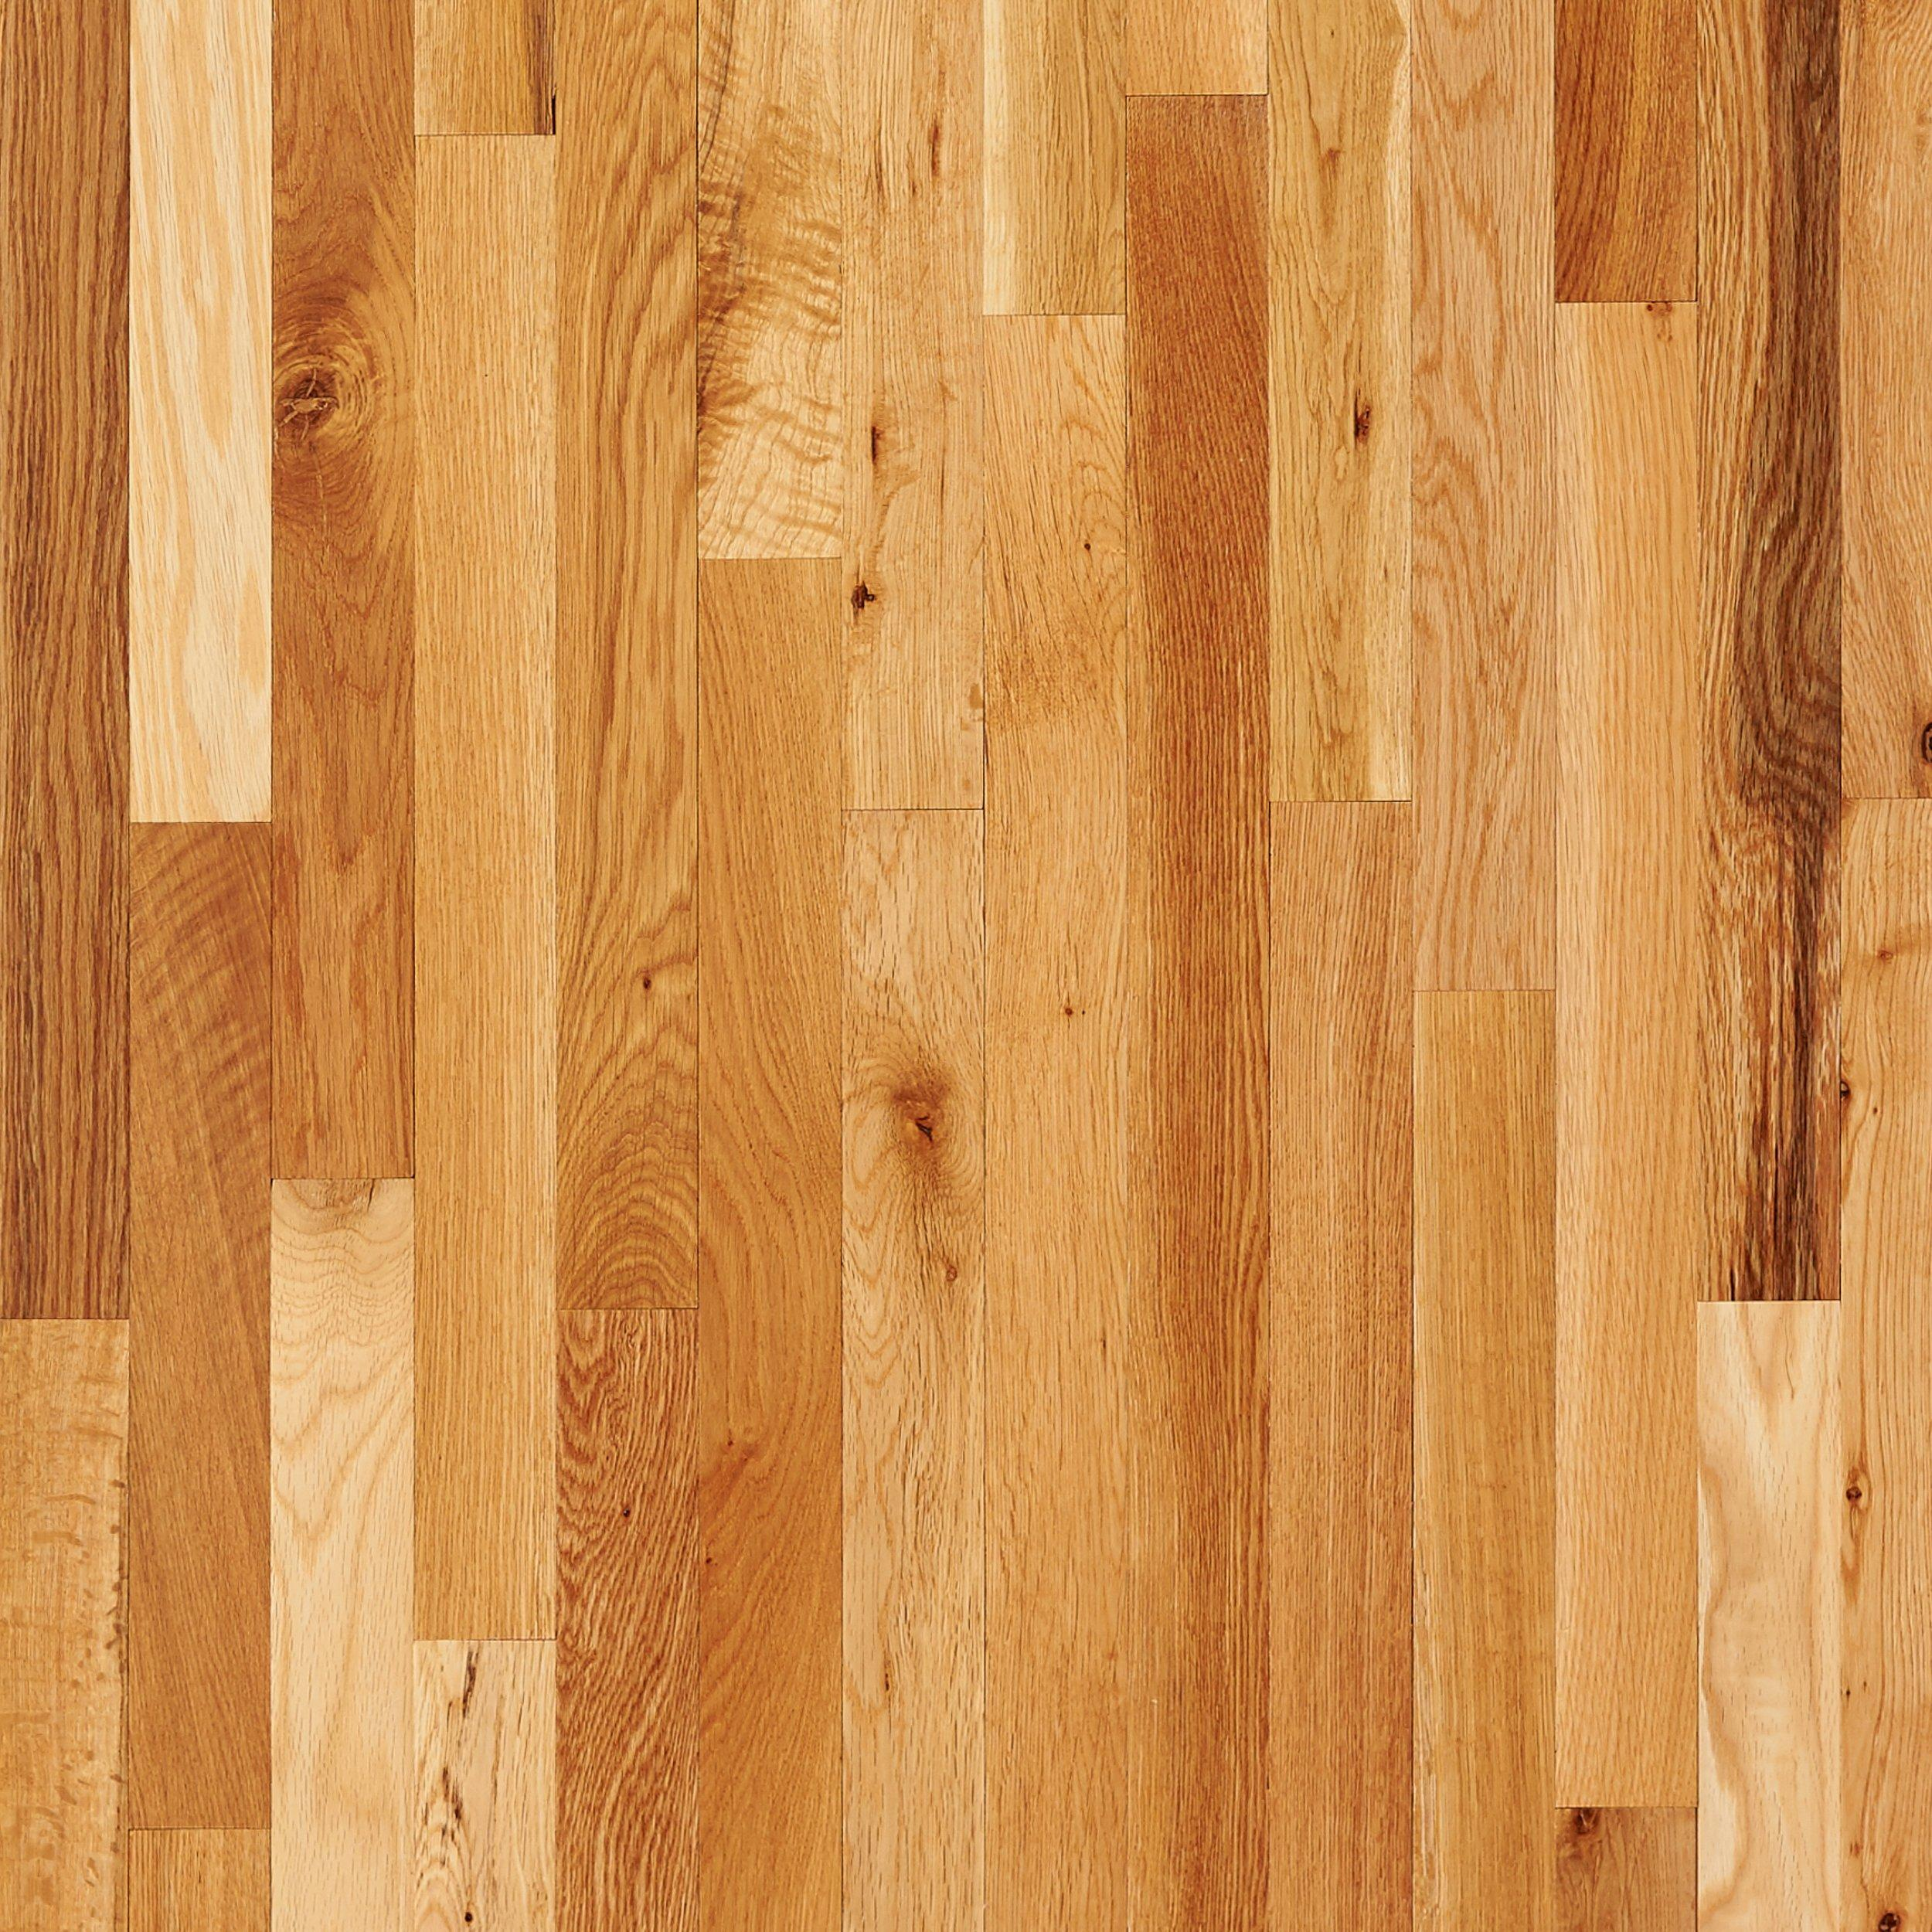 Charmant Natural Oak Smooth Solid Hardwood